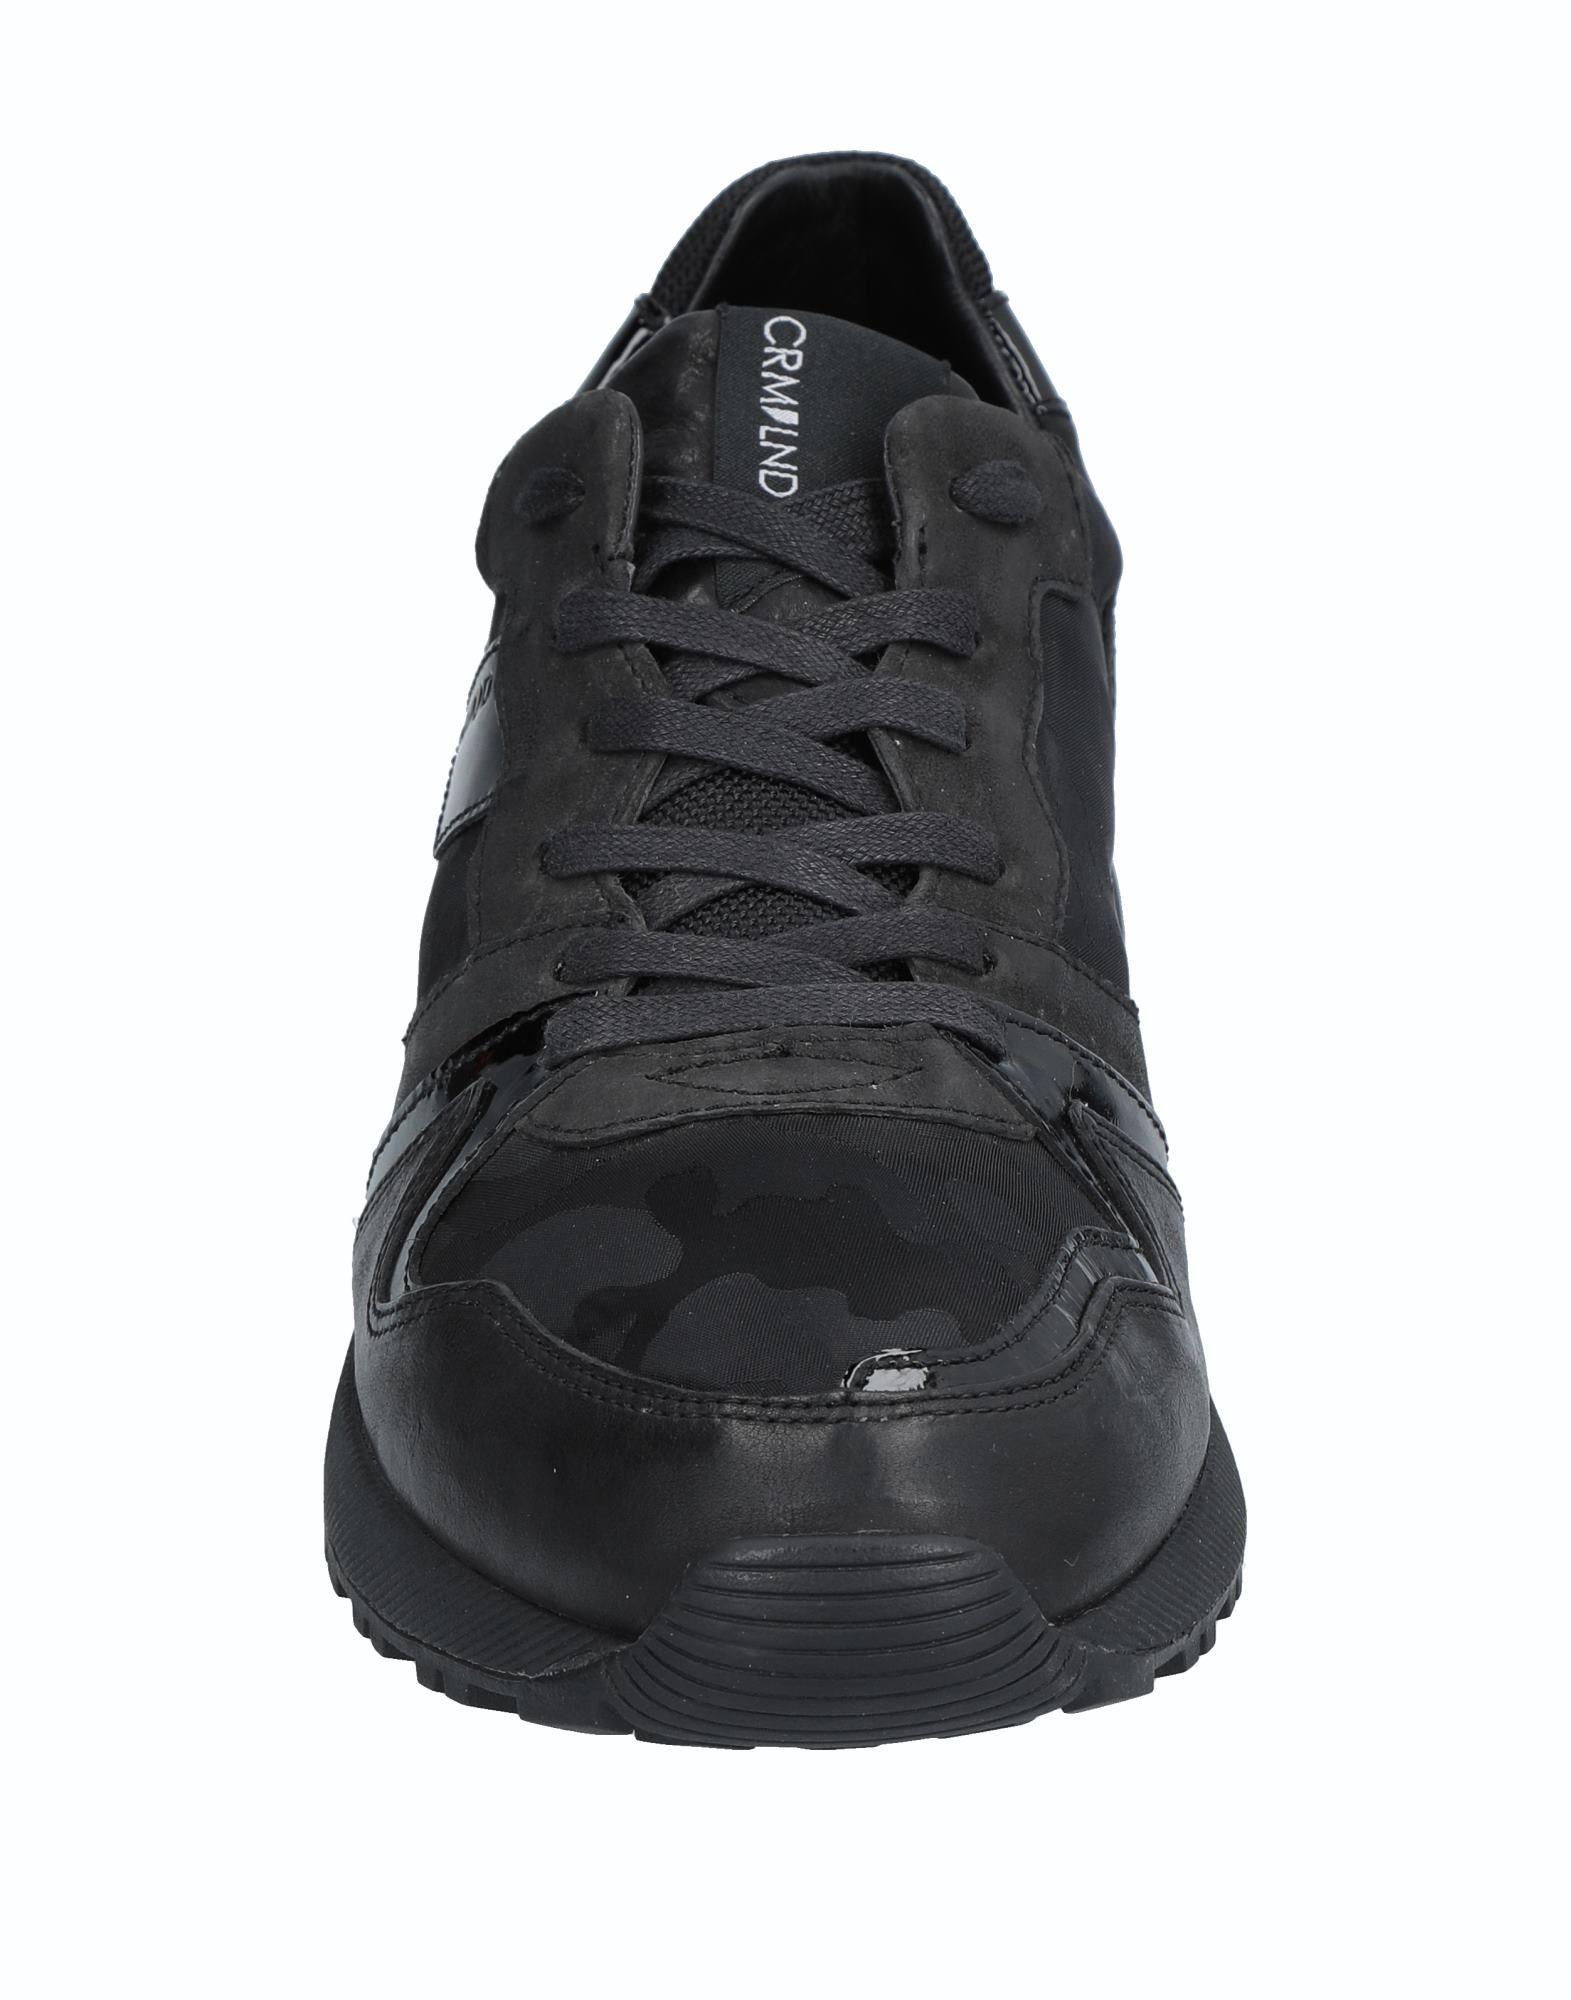 Crime London London London Sneakers Herren  11538174DE Neue Schuhe d68853